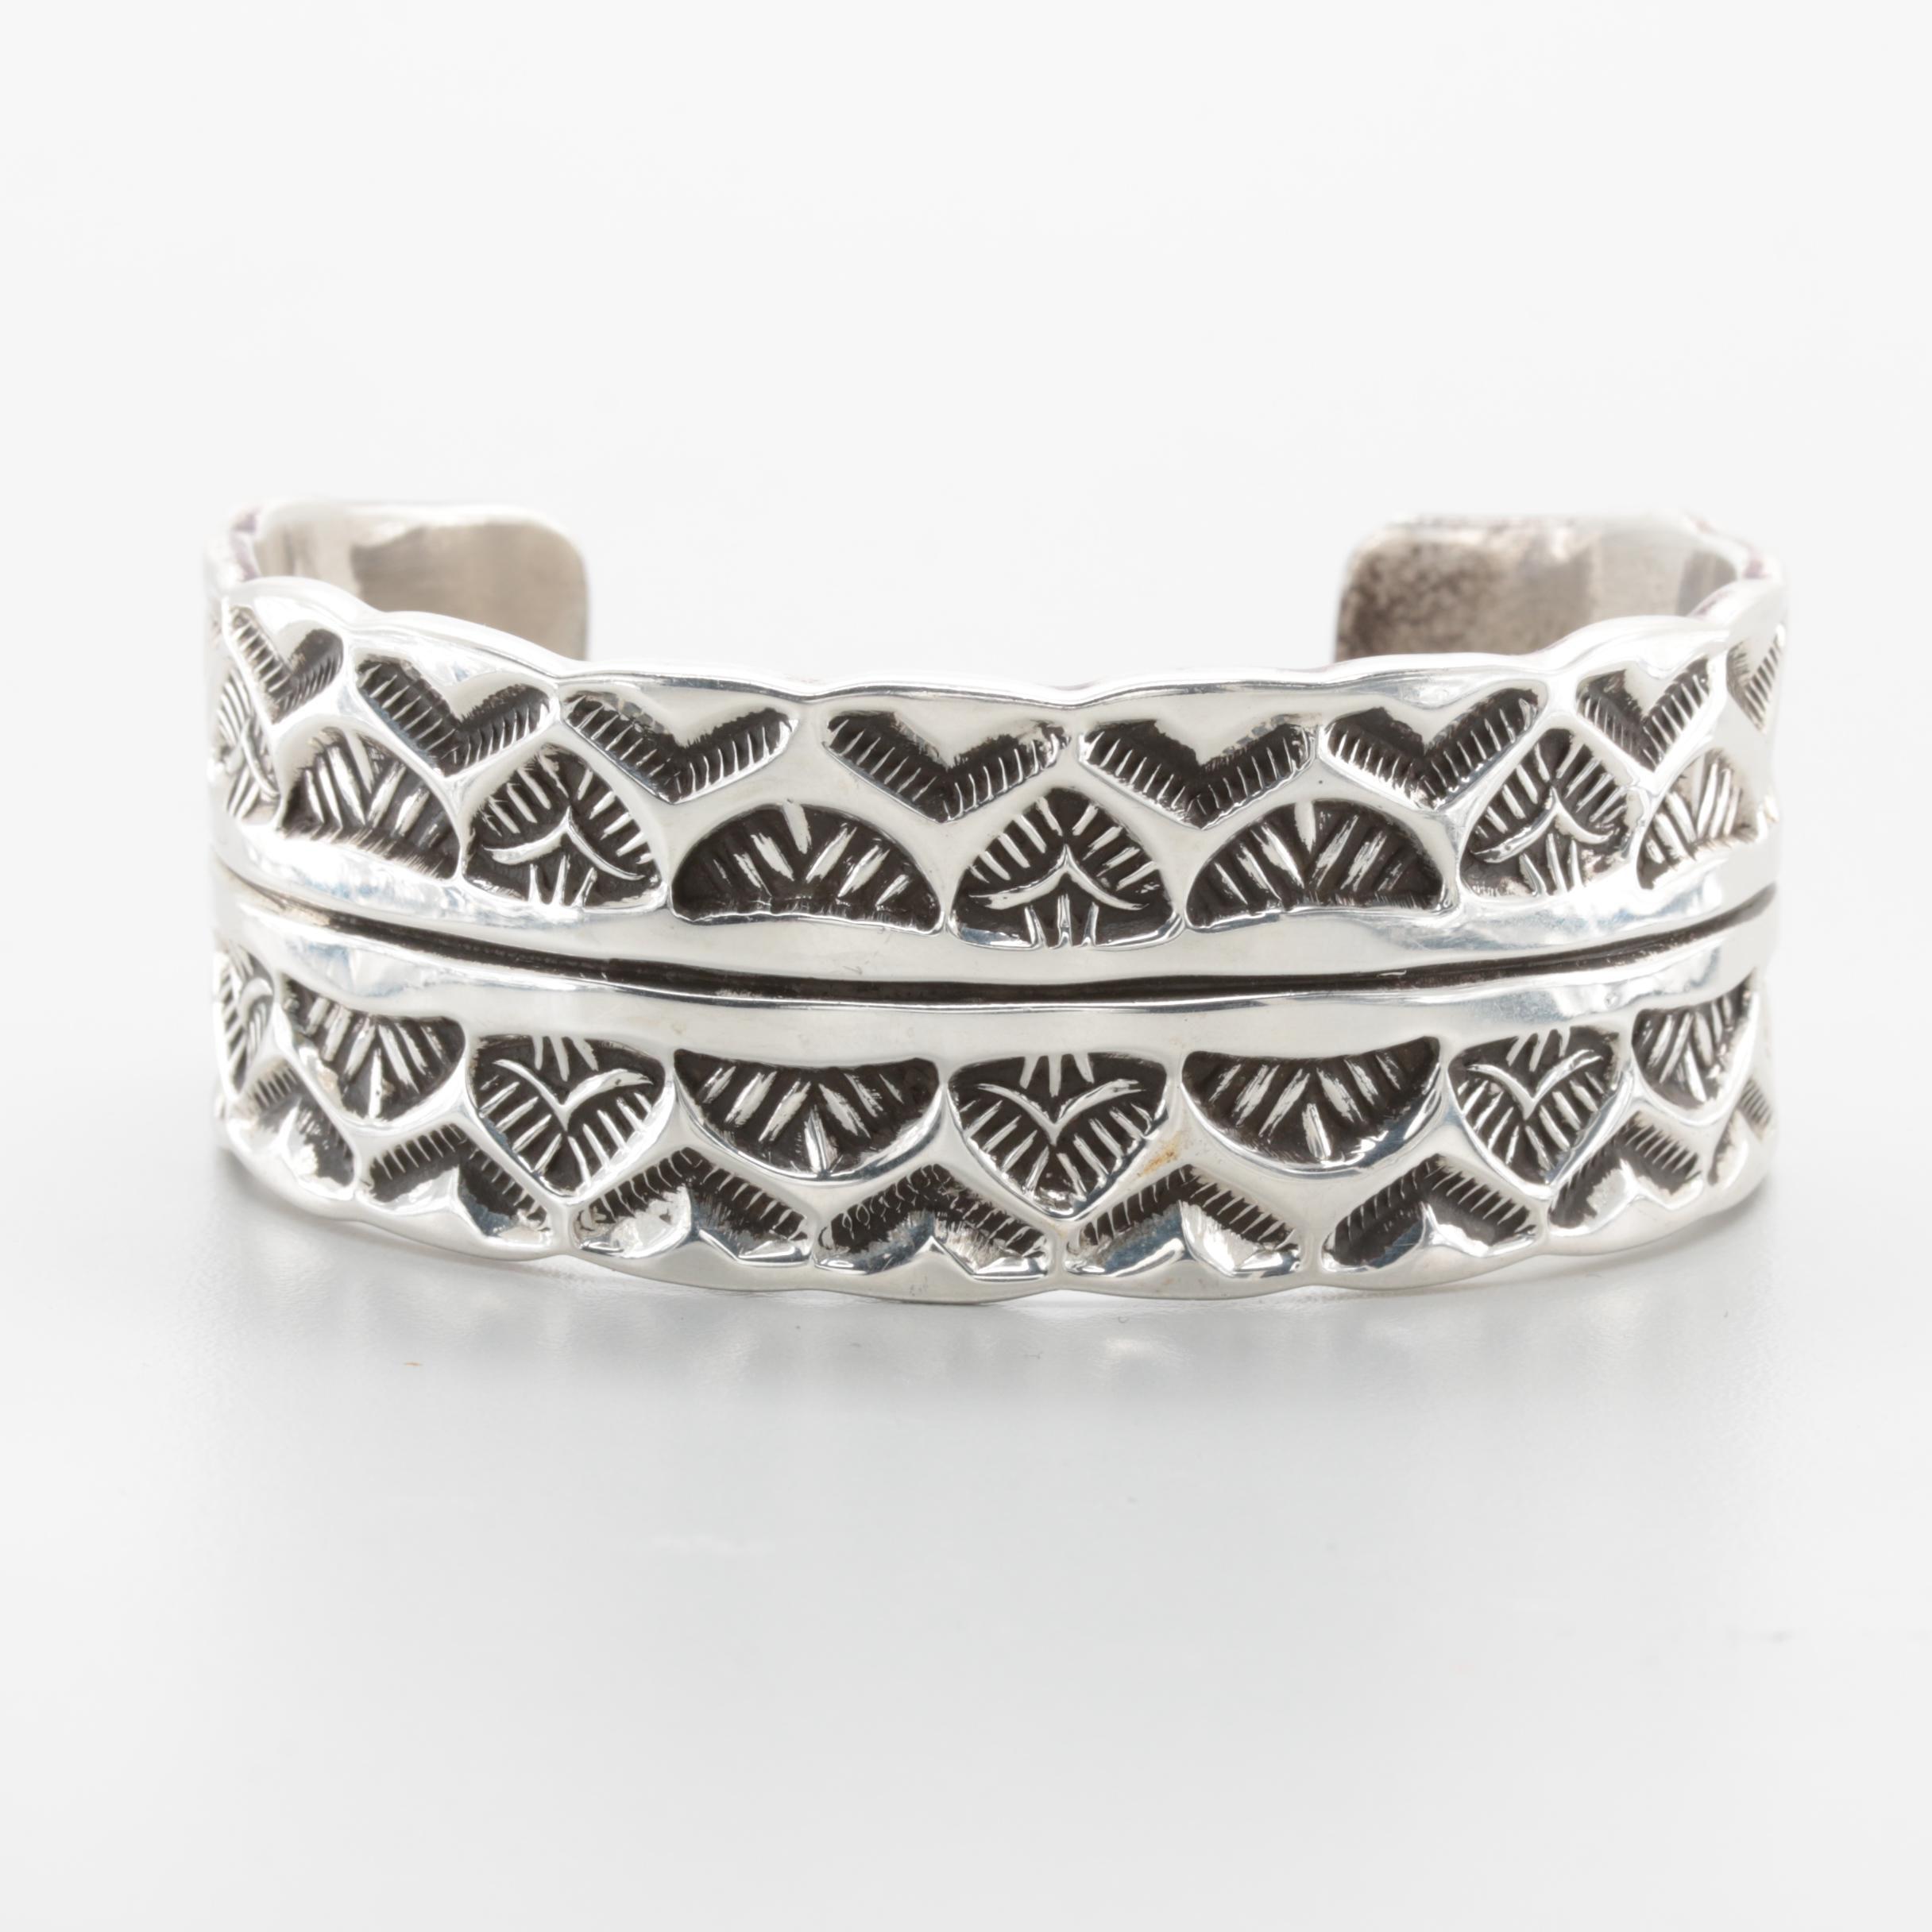 Chimney Butte with Sylvia Nuguematz Sterling Silver Cuff Bracelet